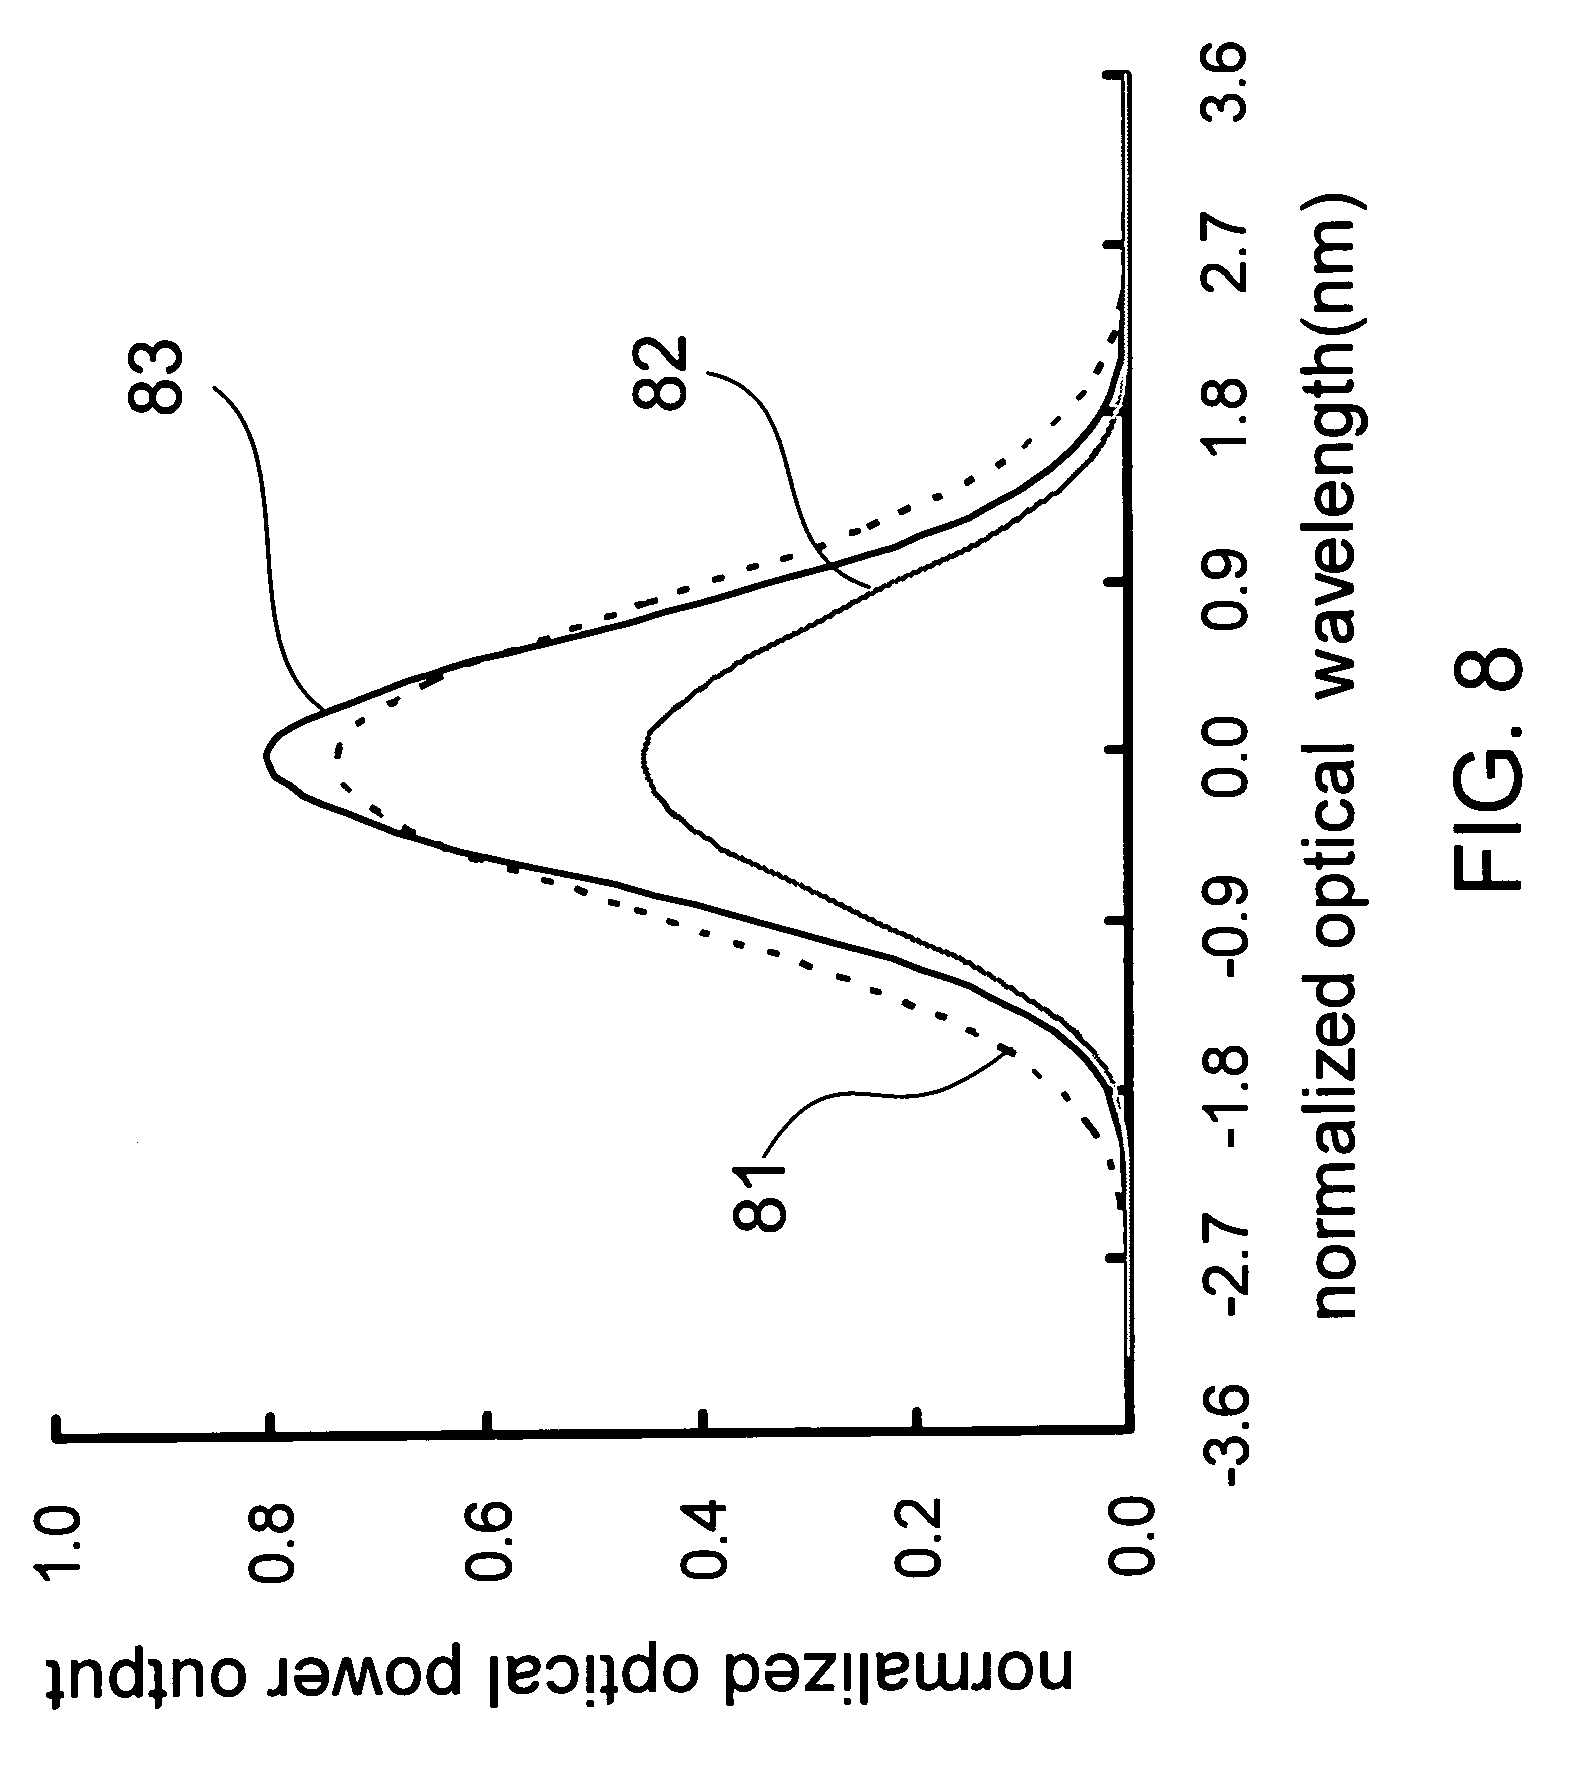 arrayed waveguide grating simulation dating